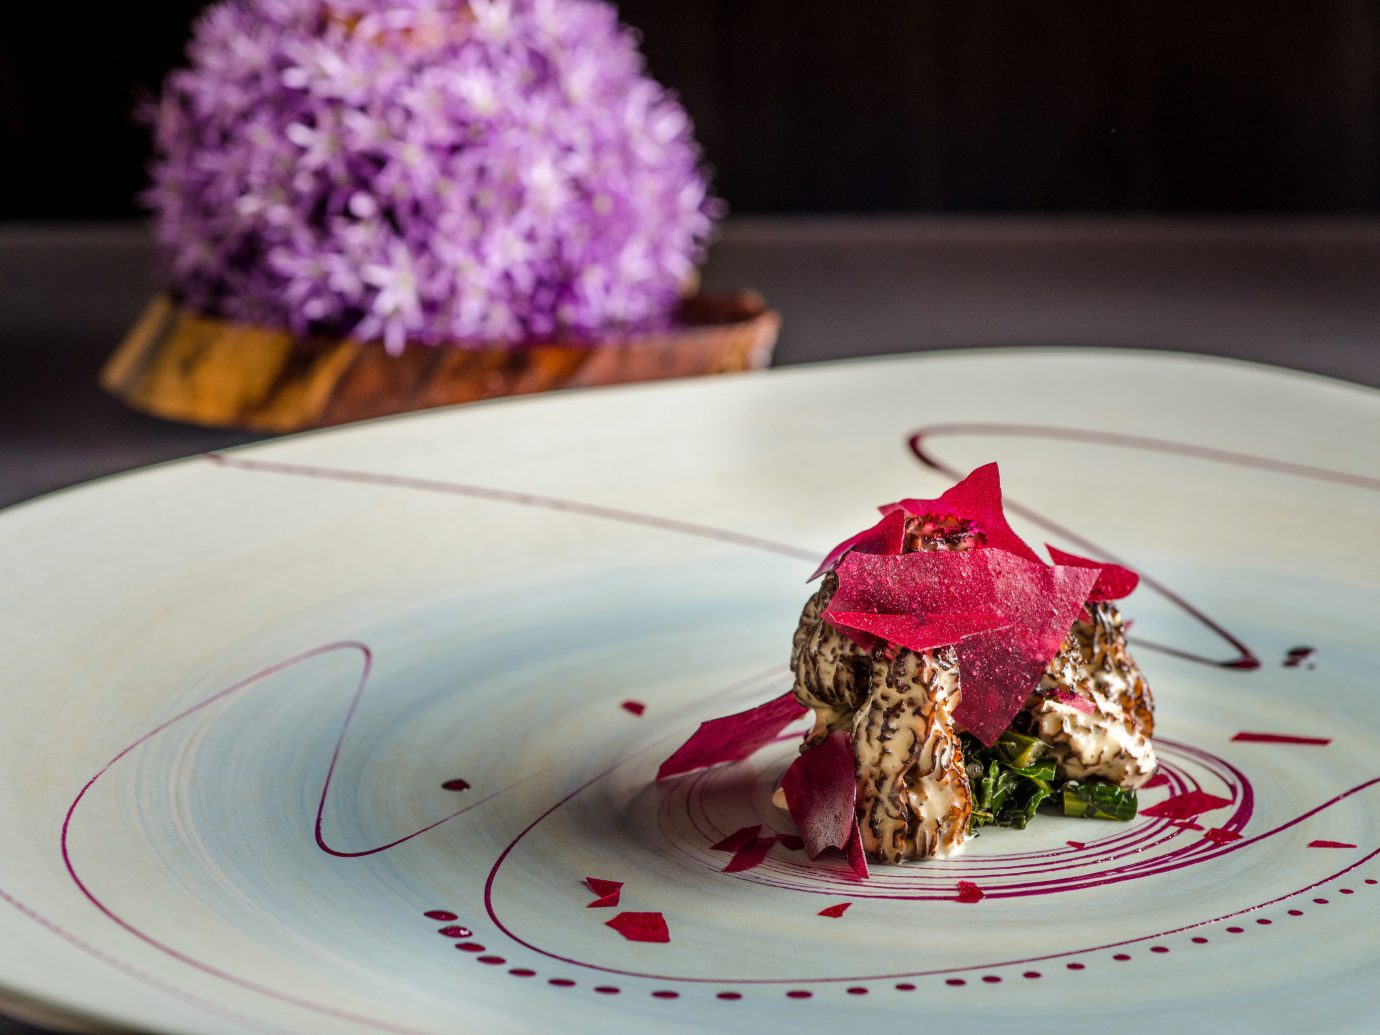 Food + Drink plate table cake food dish dessert flower produce slice icing white meal sweetness piece de resistance